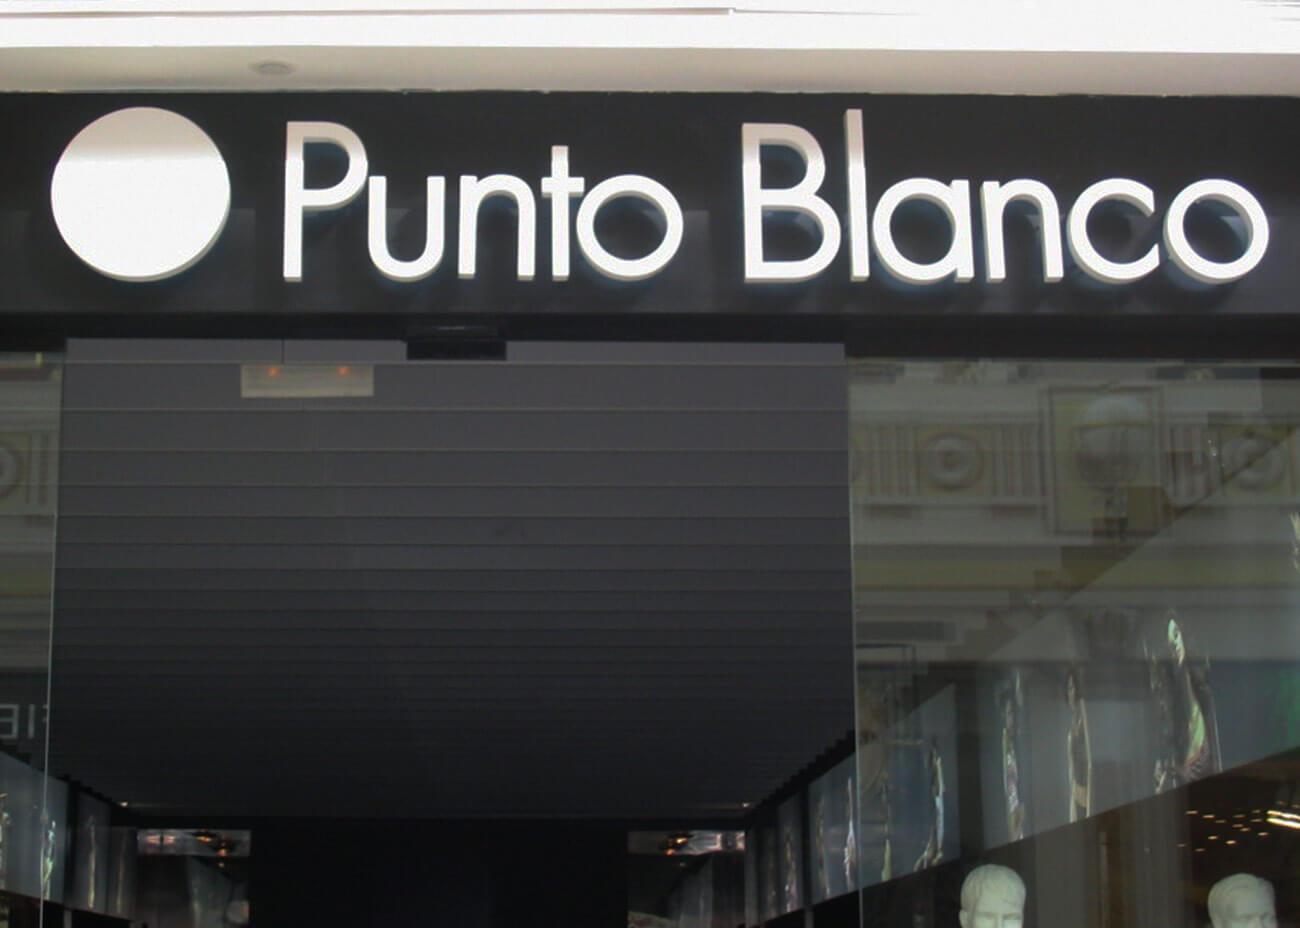 punto-blanco-img01-caad-retail-design-barcelona